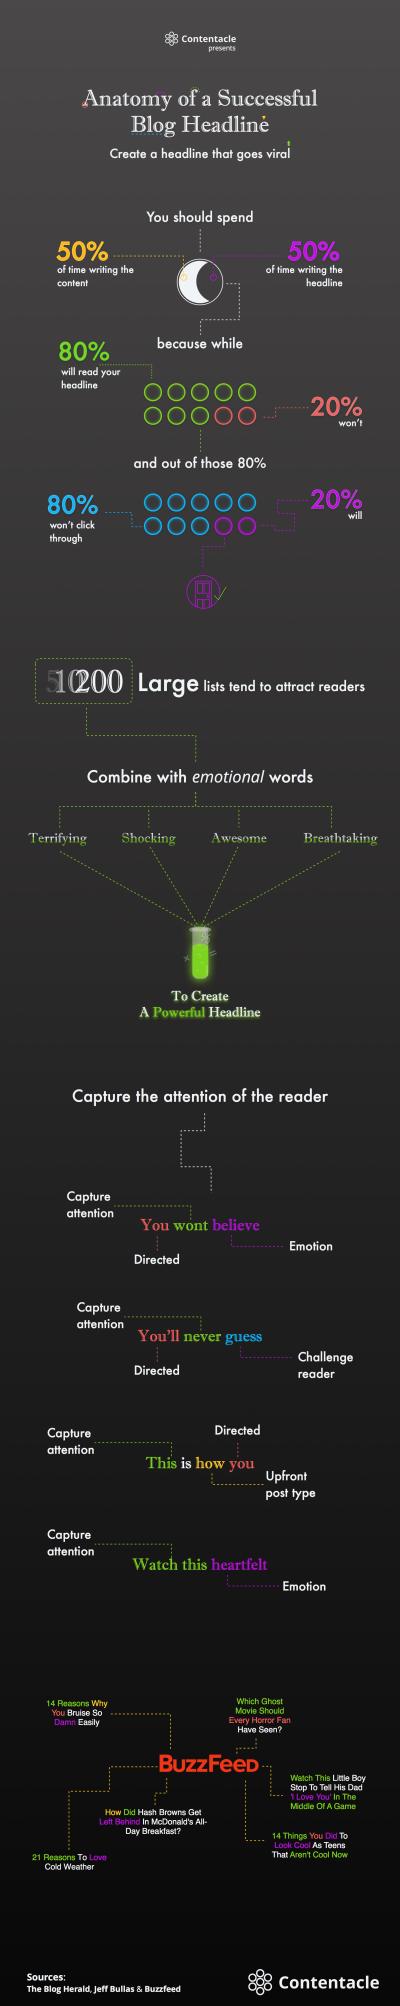 Anatomy of a Successful Blog Headline